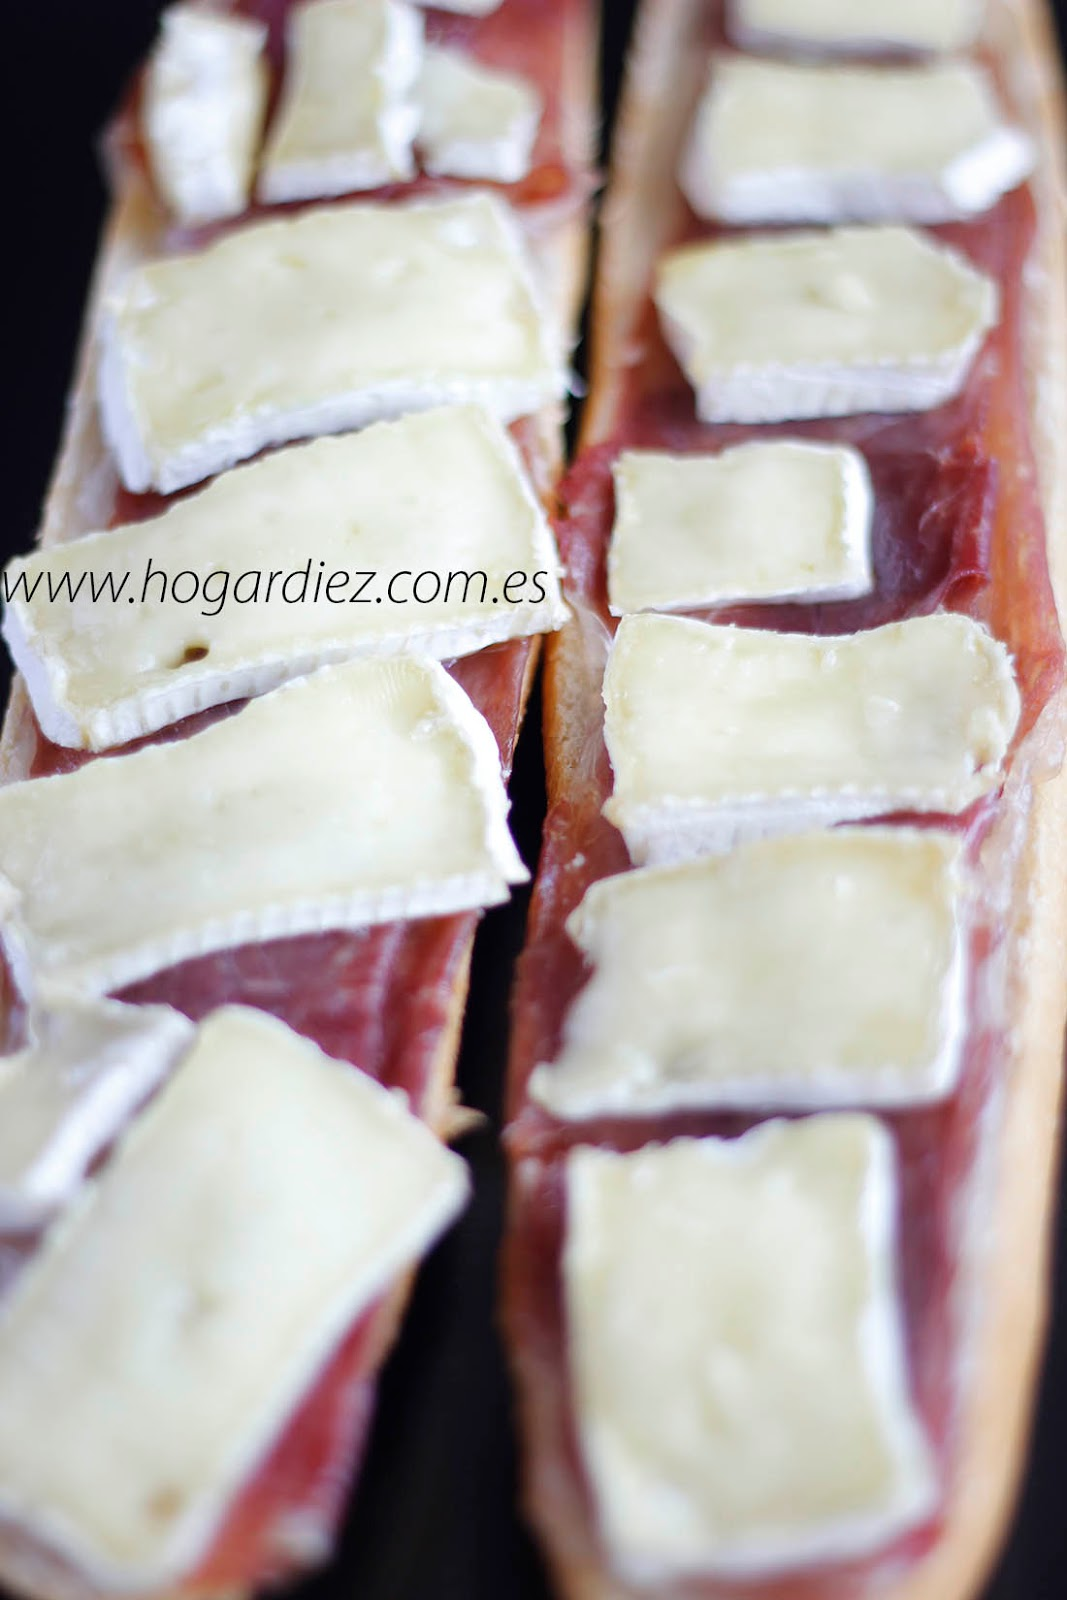 Tosta de jamón y queso brie